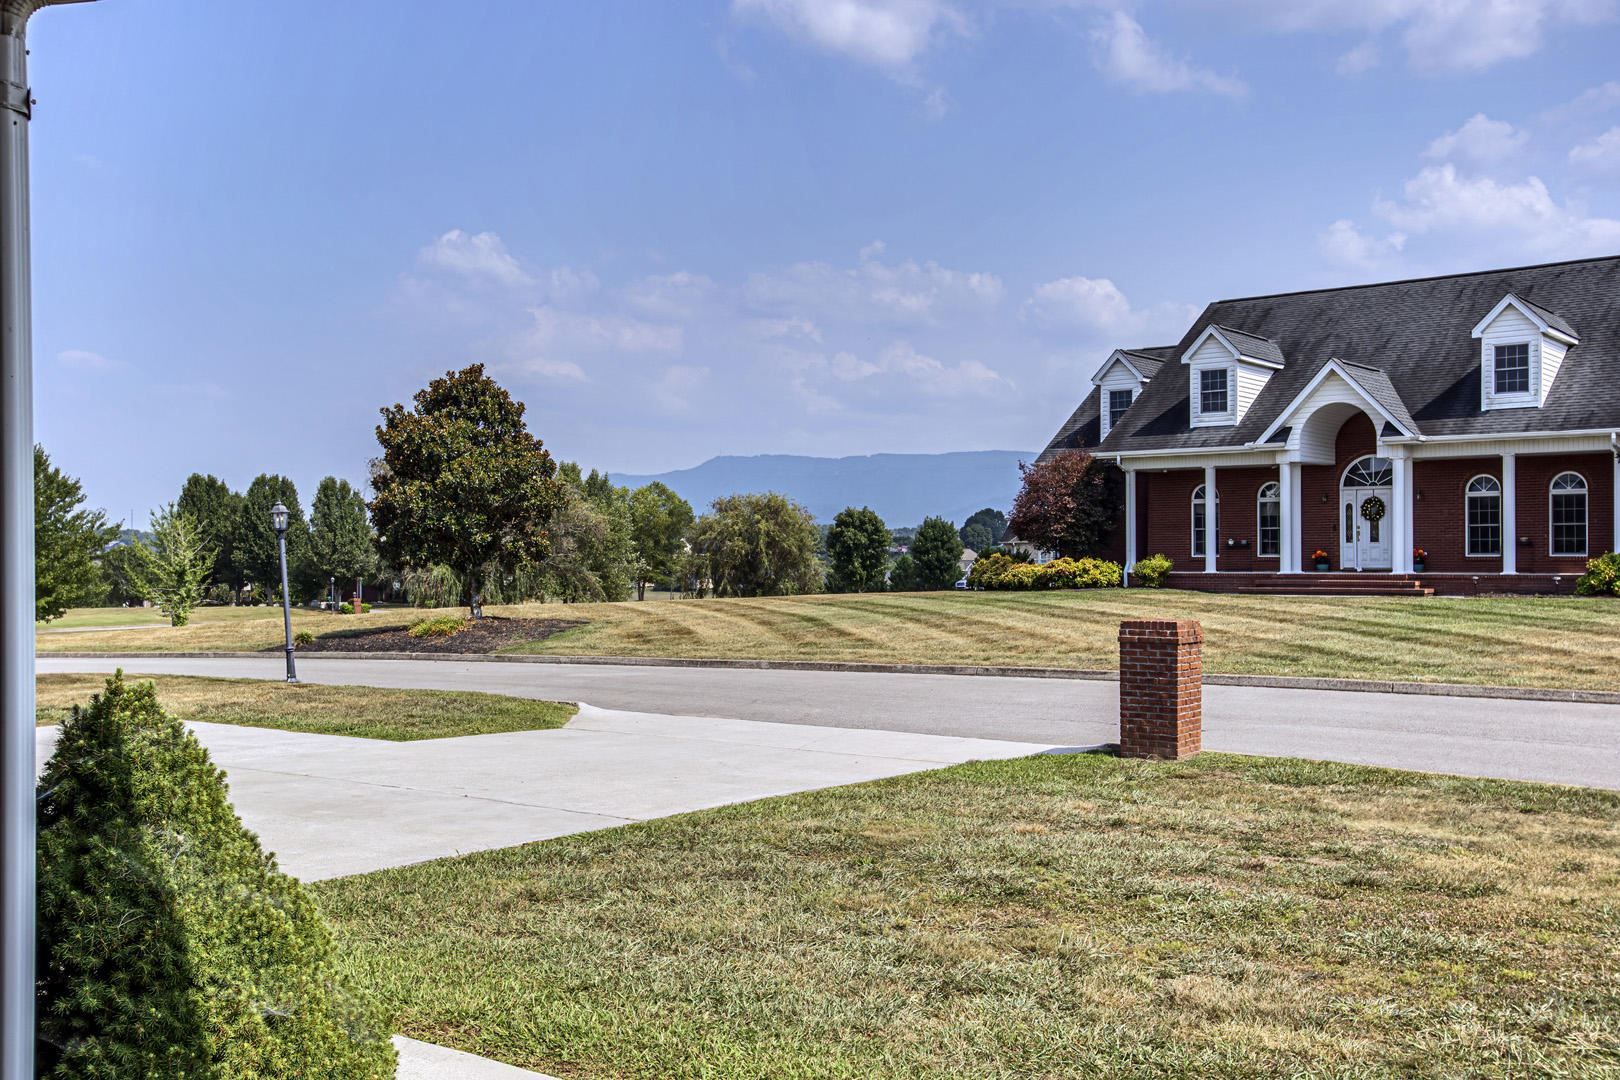 Photo of 515 Jockey Club Lane, Seymour, TN 37865 (MLS # 1162266)